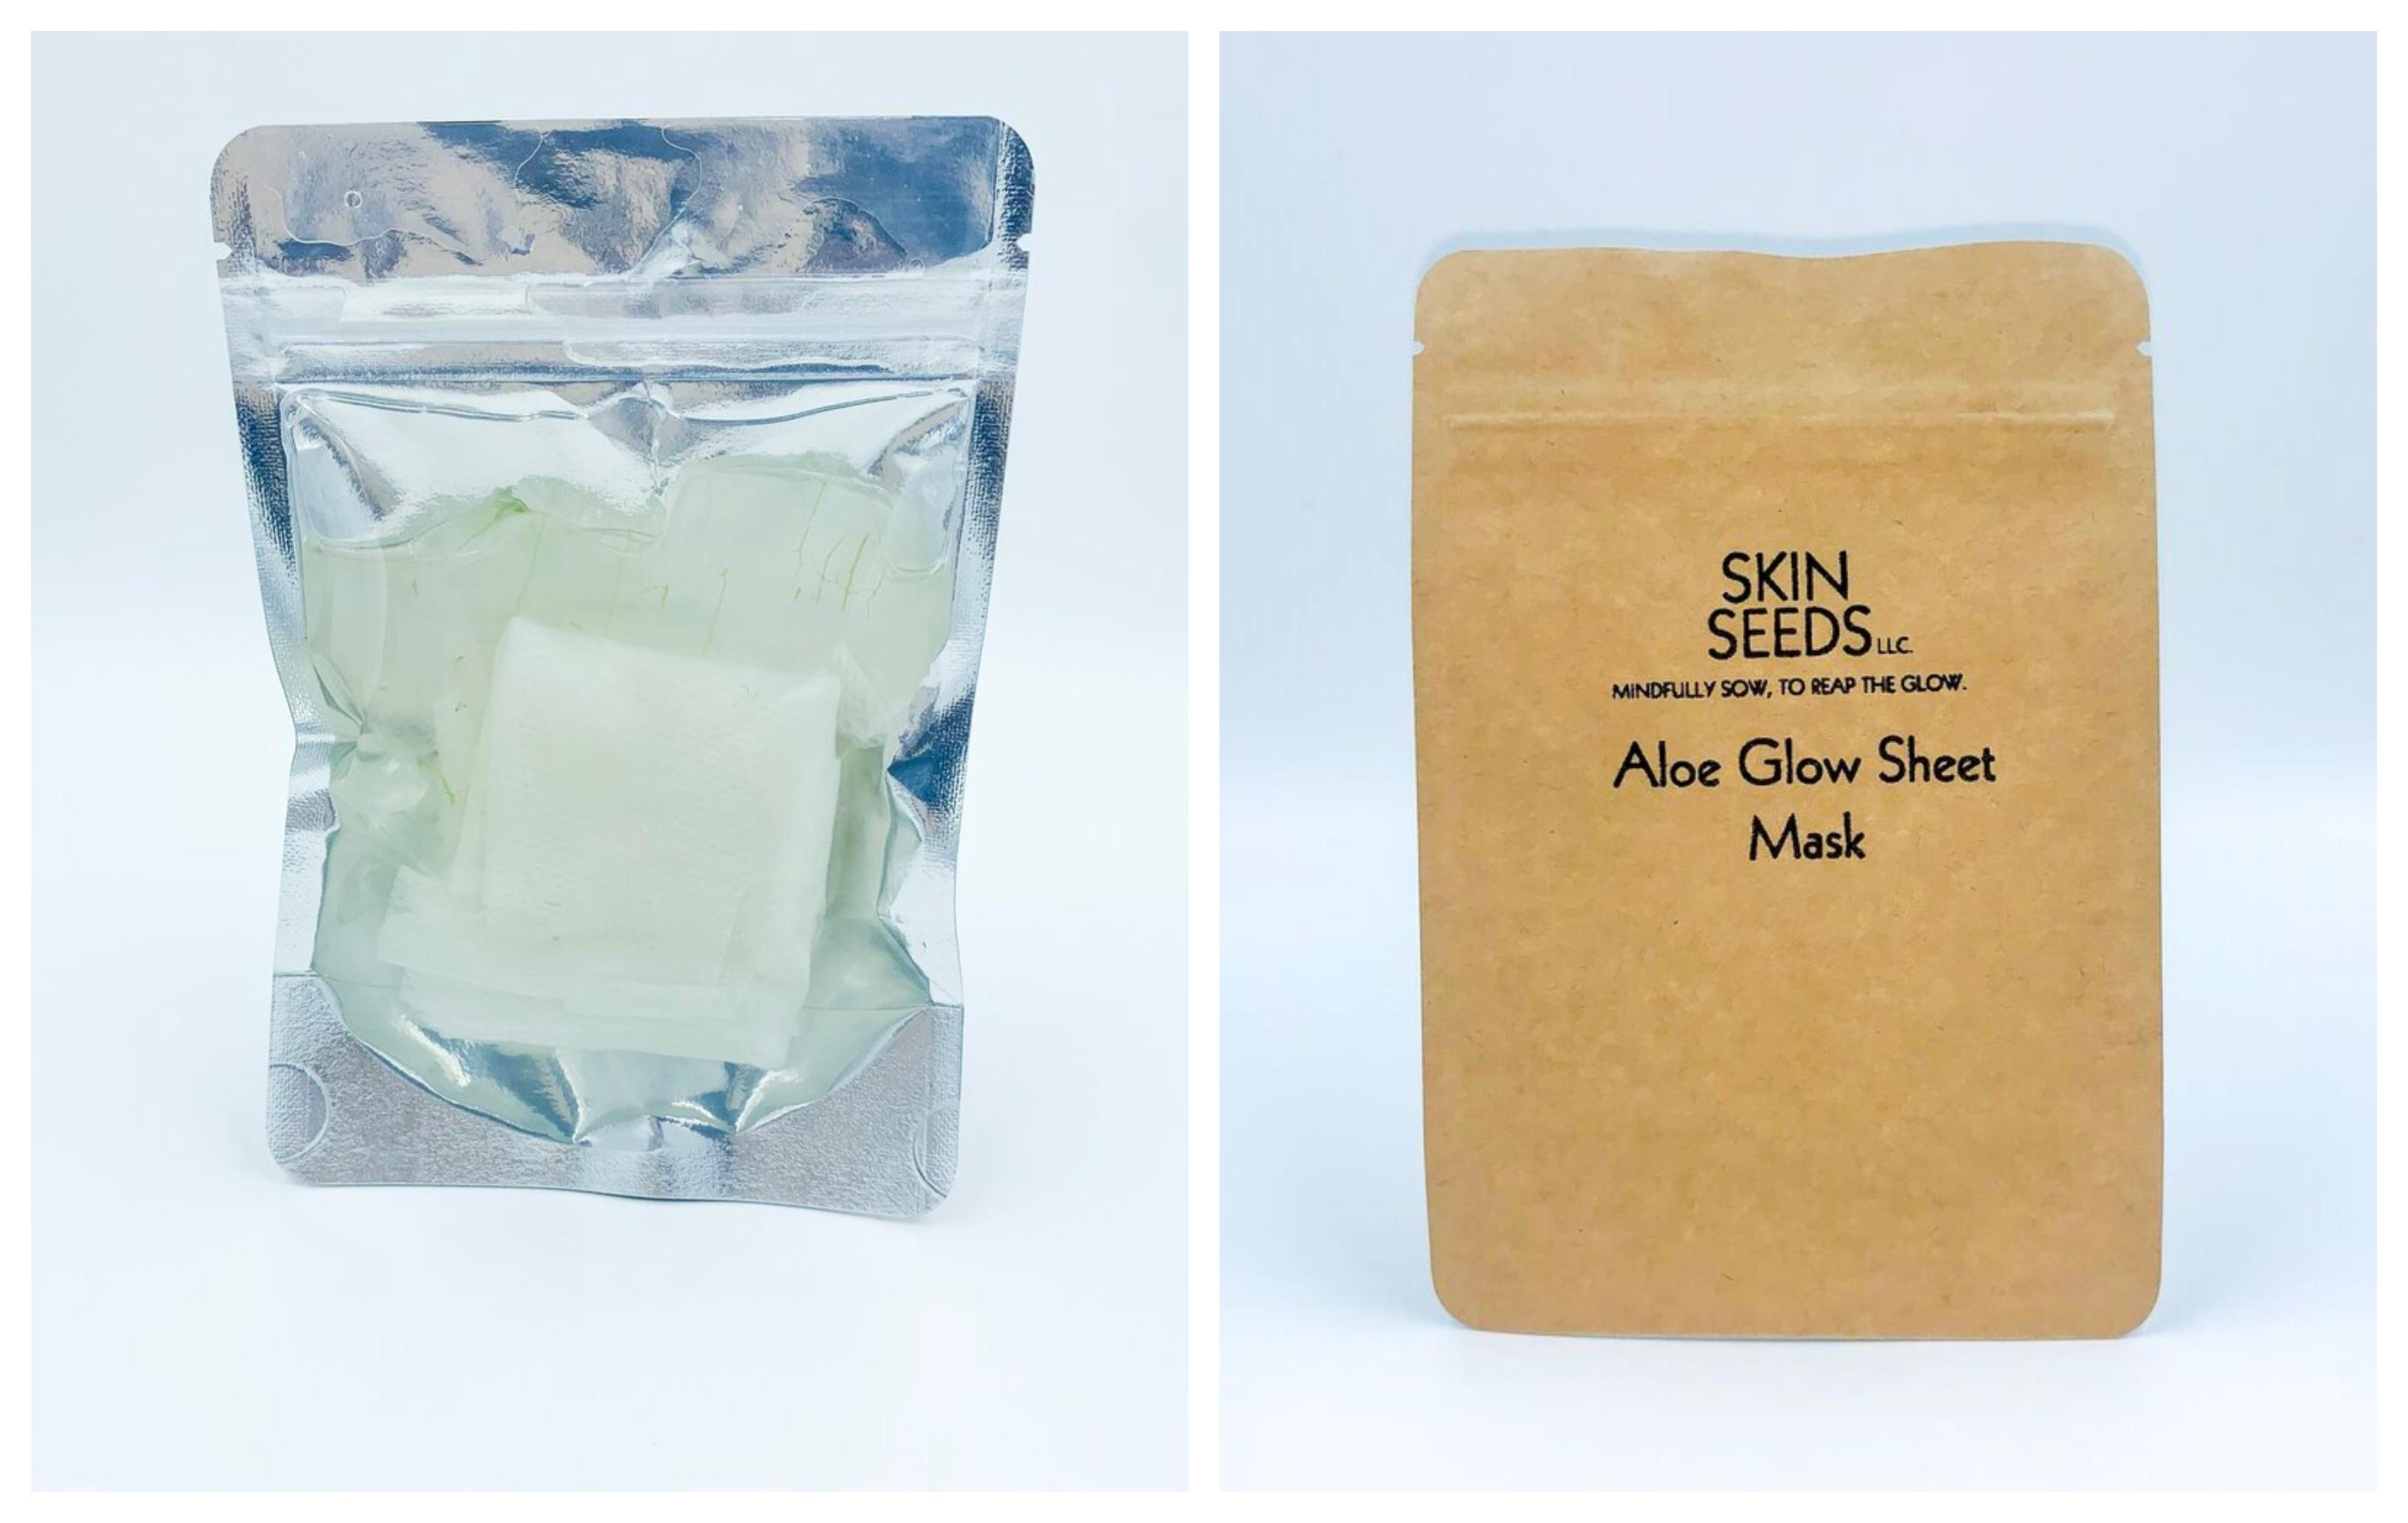 Skin Seeds Aloe Glow Sheet